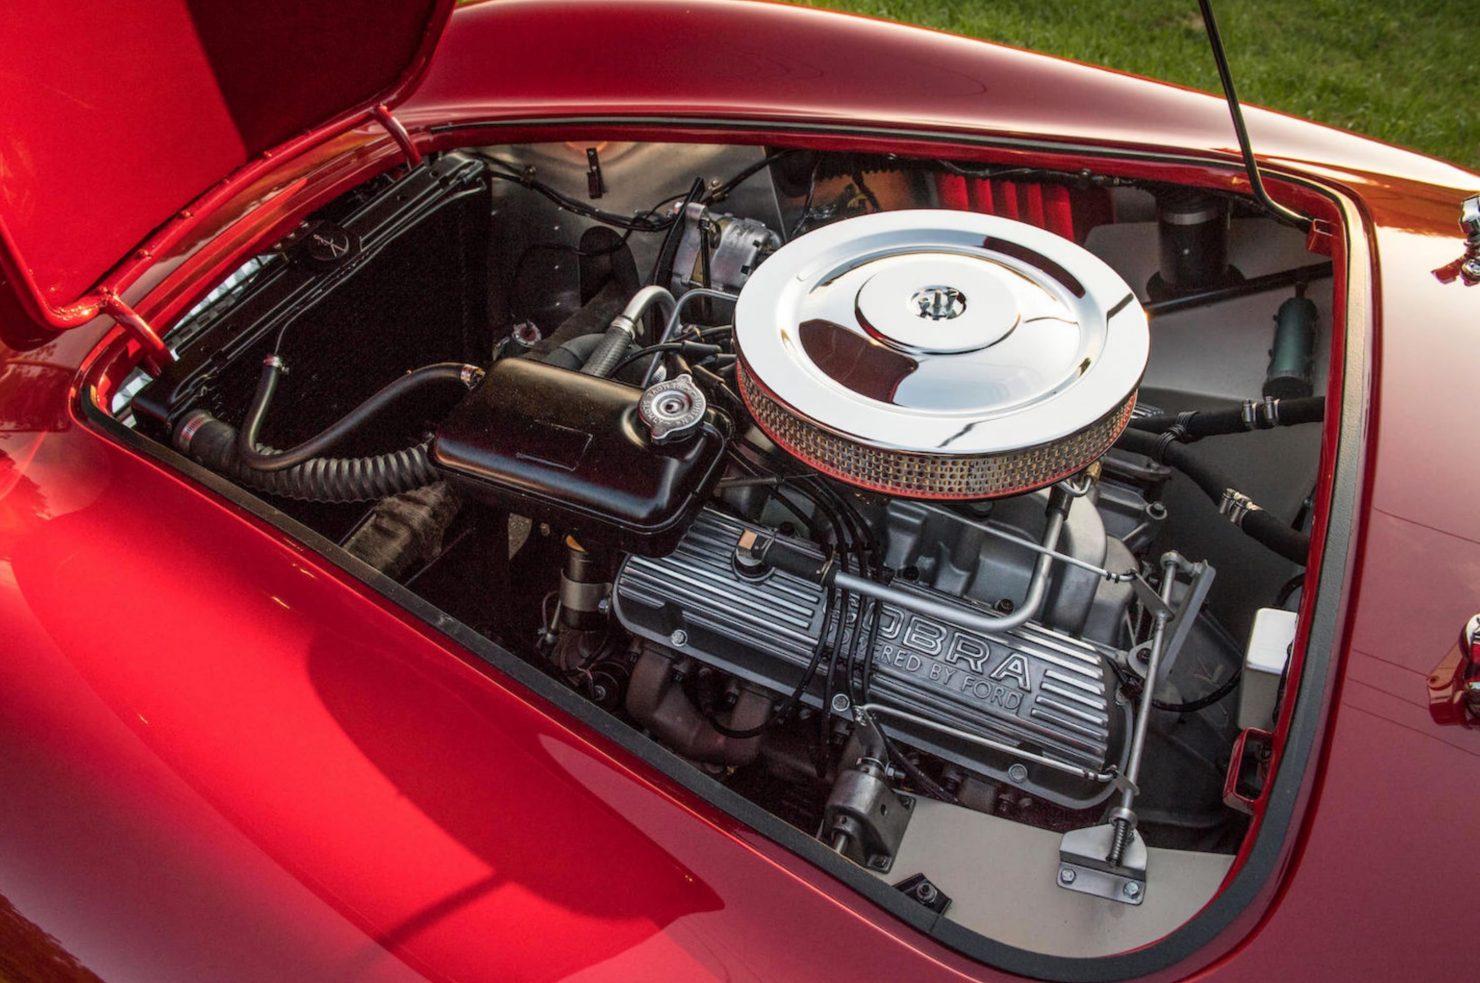 shelby ac cobra 289 11 1480x983 - 1964 Shelby AC Cobra 289